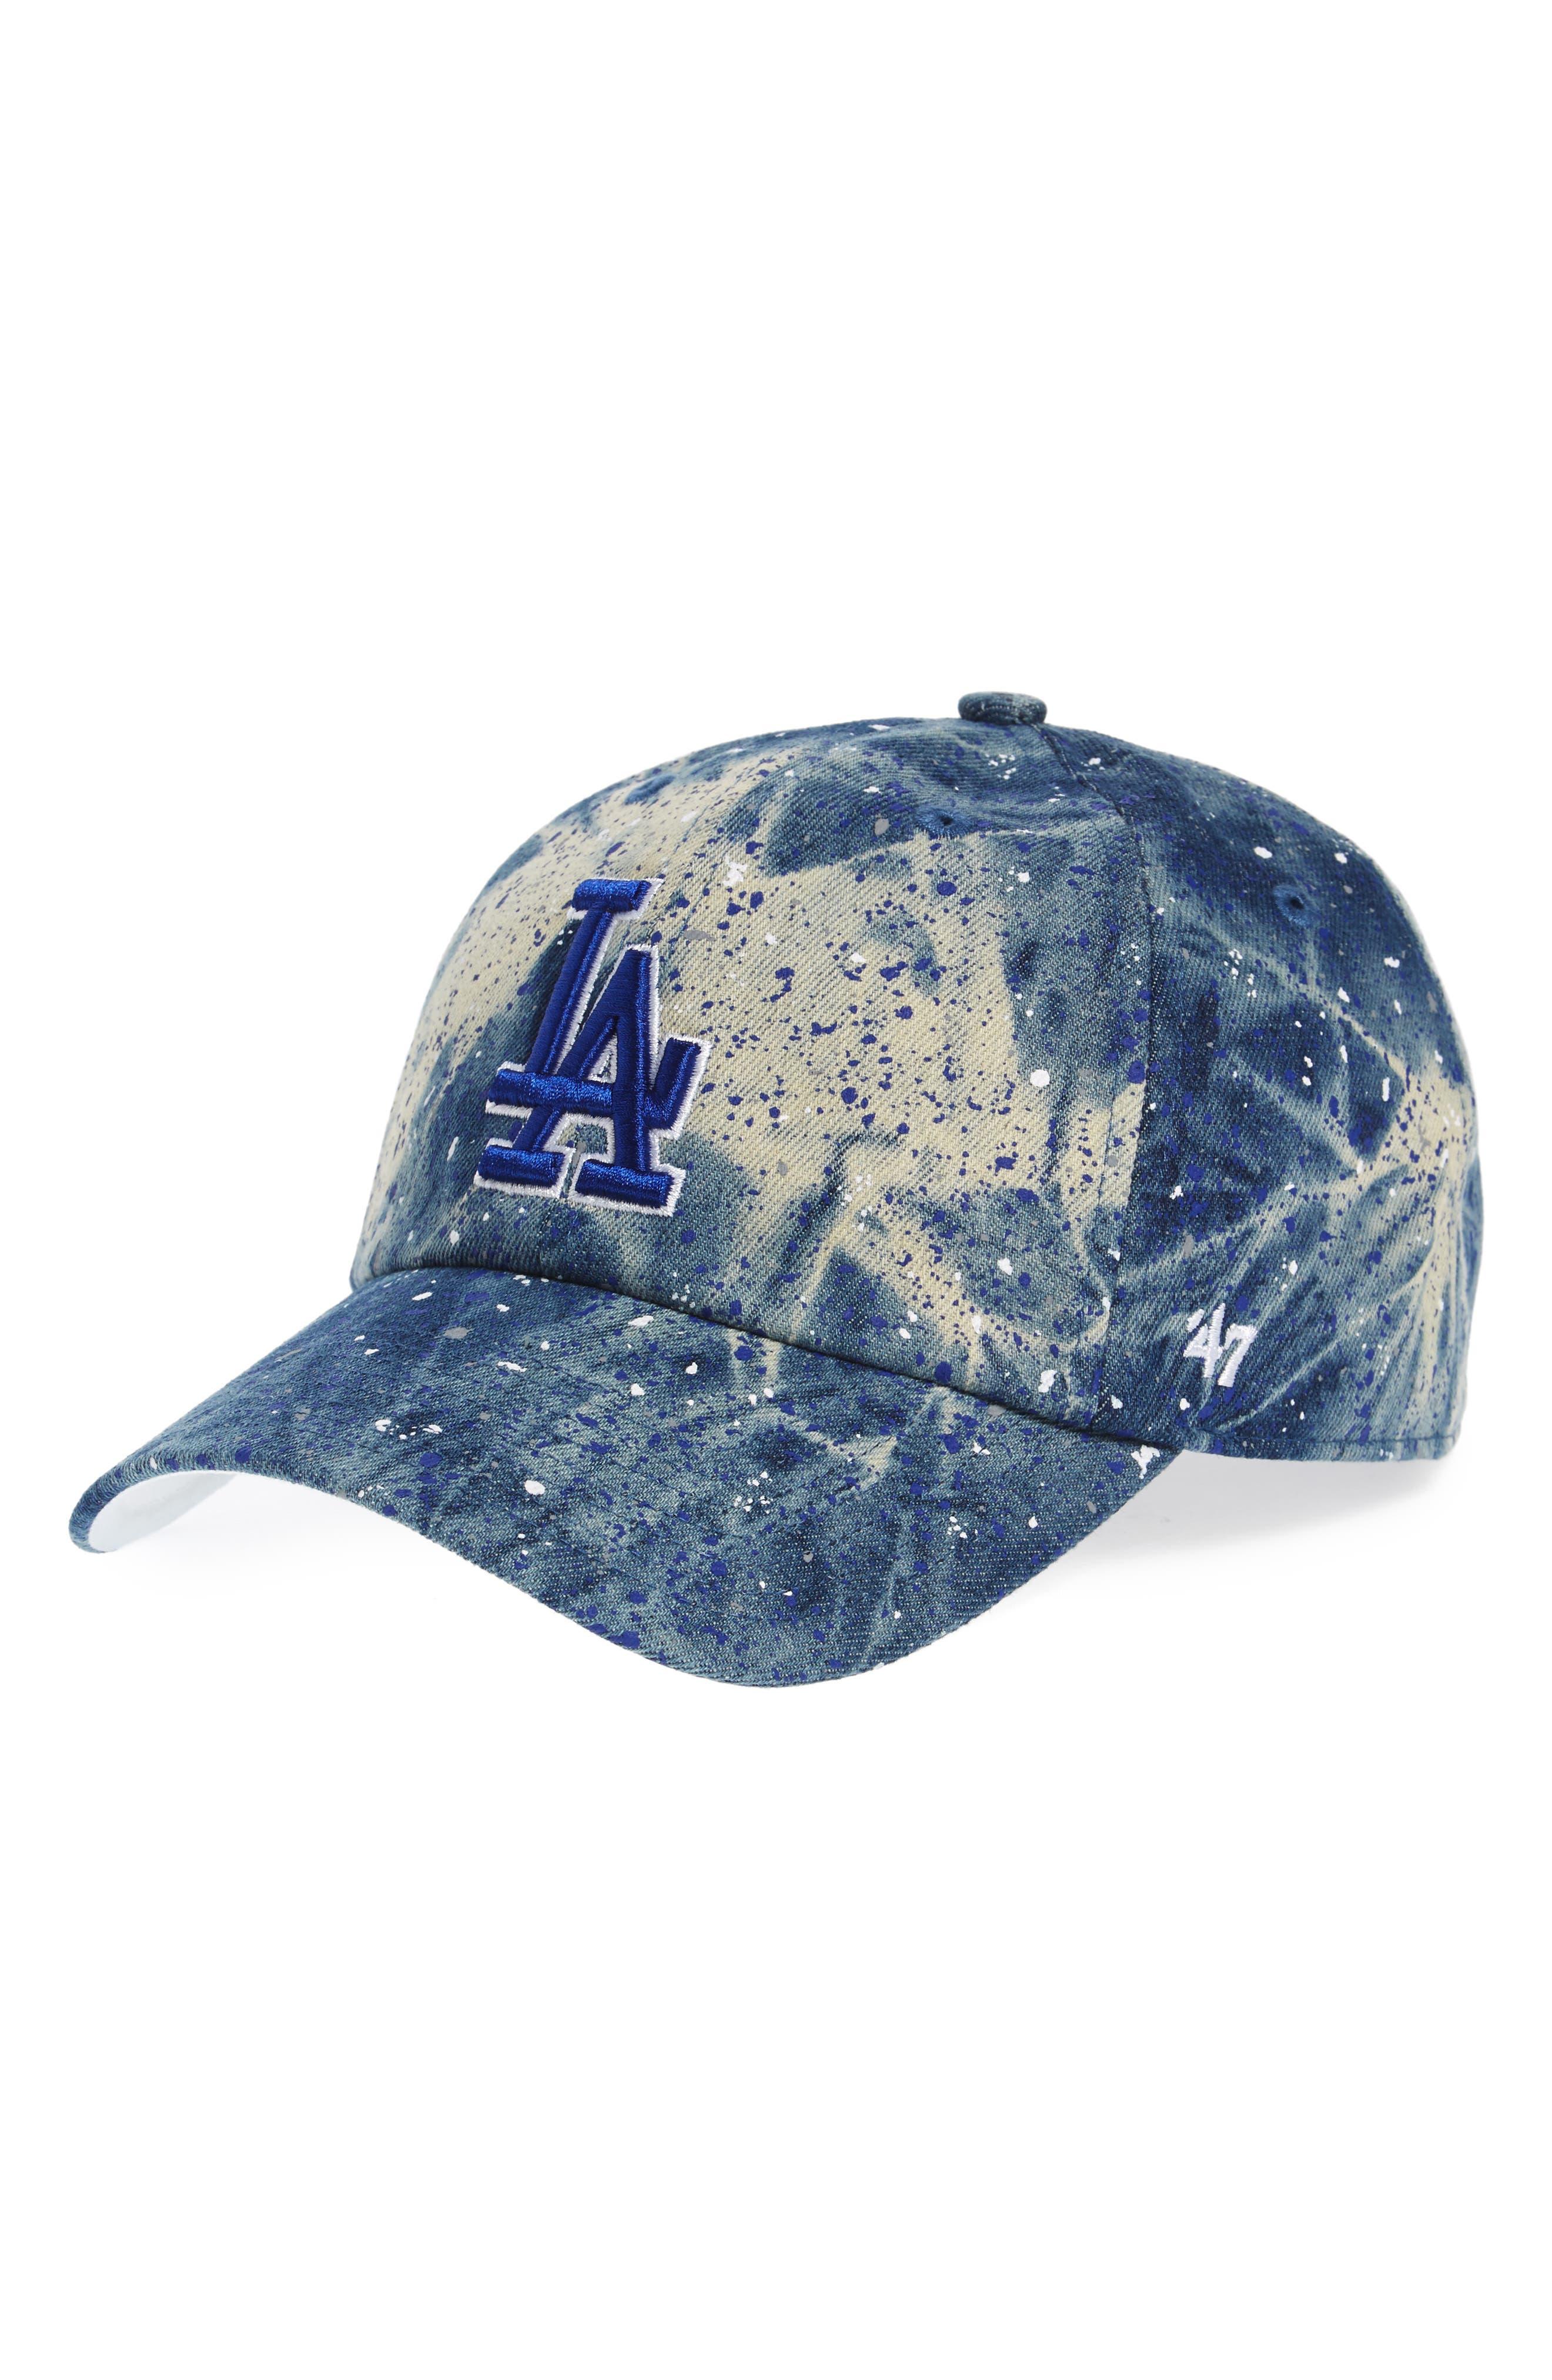 Los Angeles Dodgers - Blue Splatter Baseball Cap,                         Main,                         color, Blue